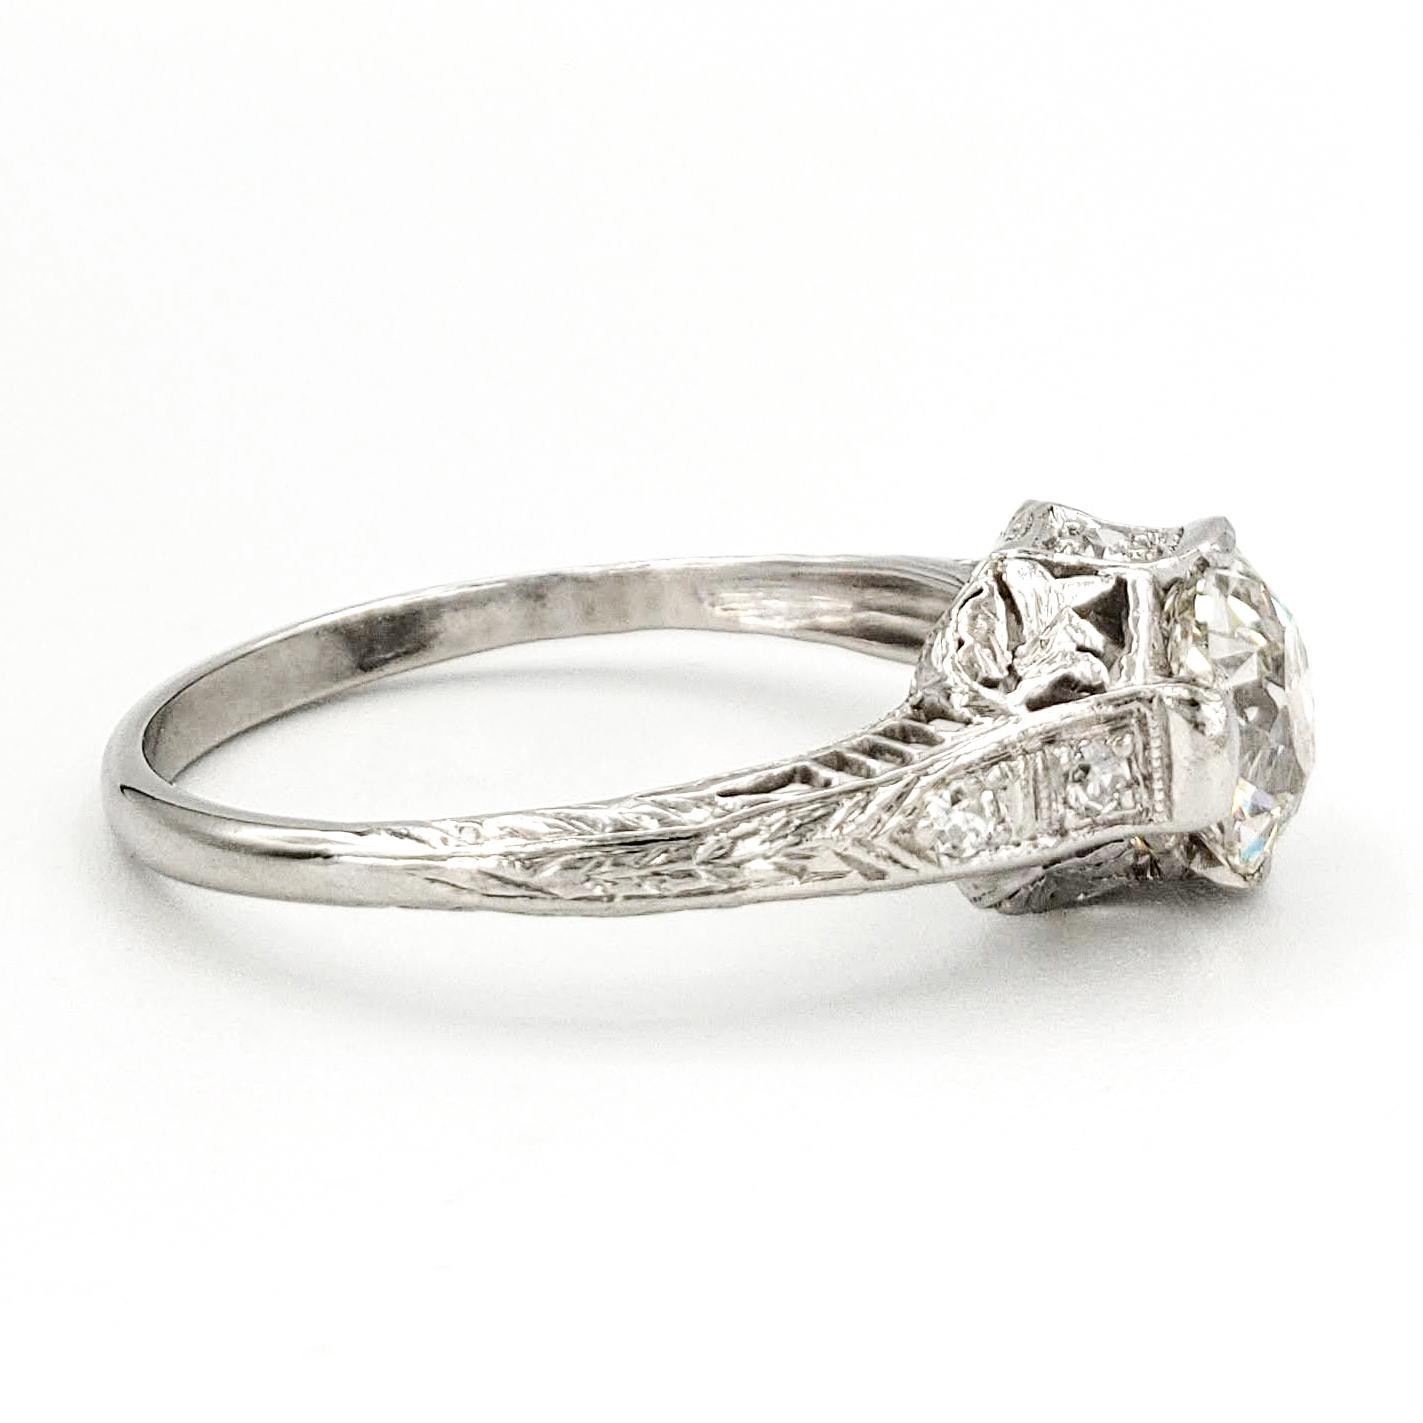 vintage-platinum-engagement-ring-with-1-19-carat-old-european-cut-diamond-gia-j-si1